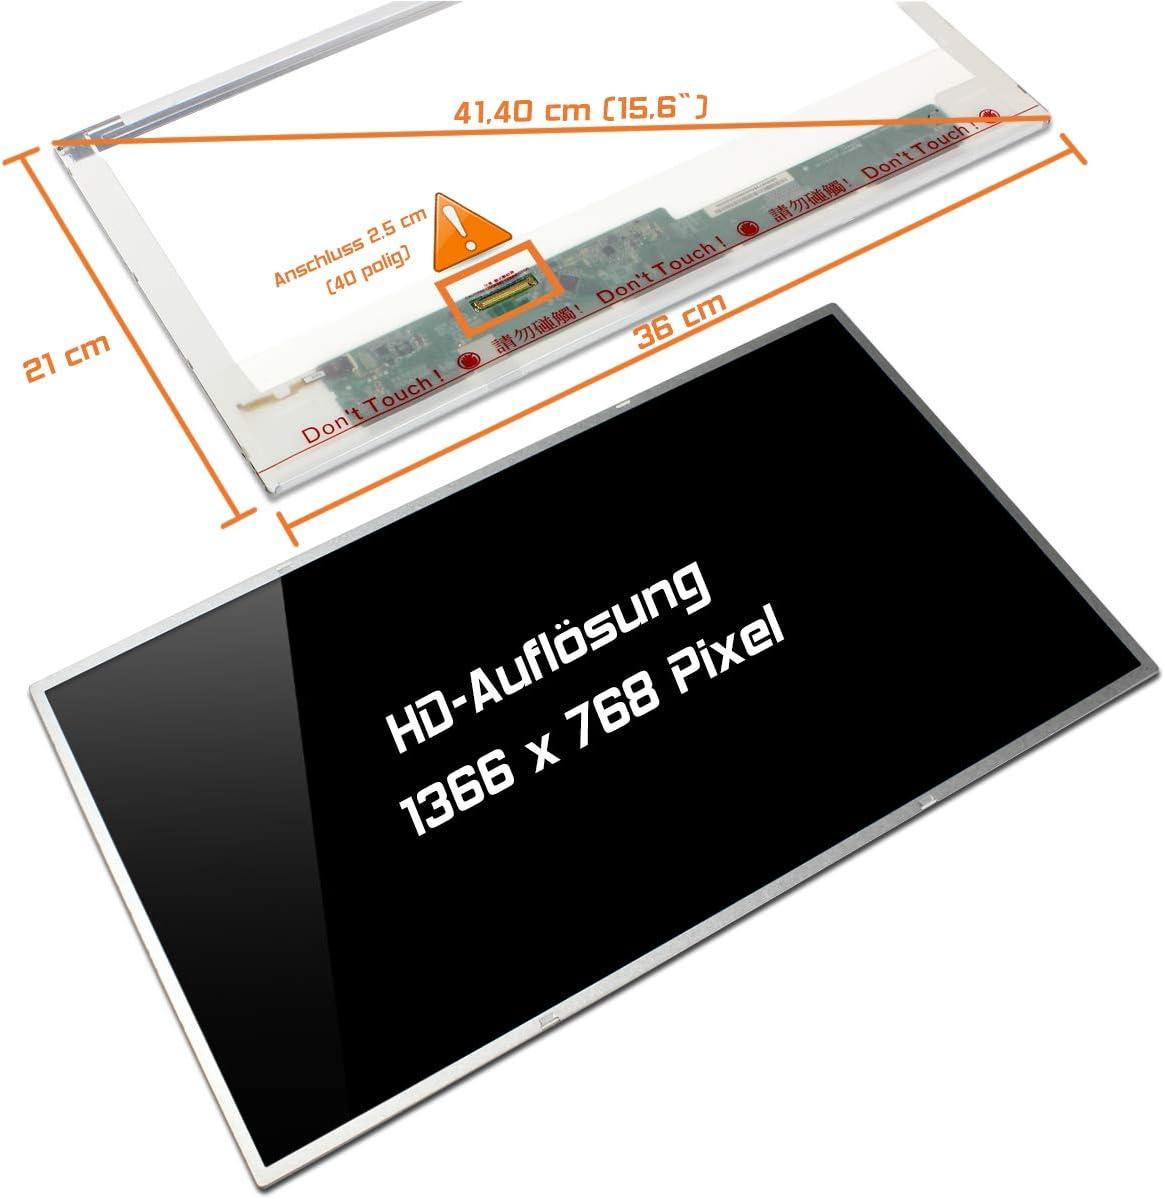 N2 Laptiptop 15,6 LED Display Screen Glossy Ersatz f/ür LG Philips LP156WH4 TL HD Bildschirm Panel